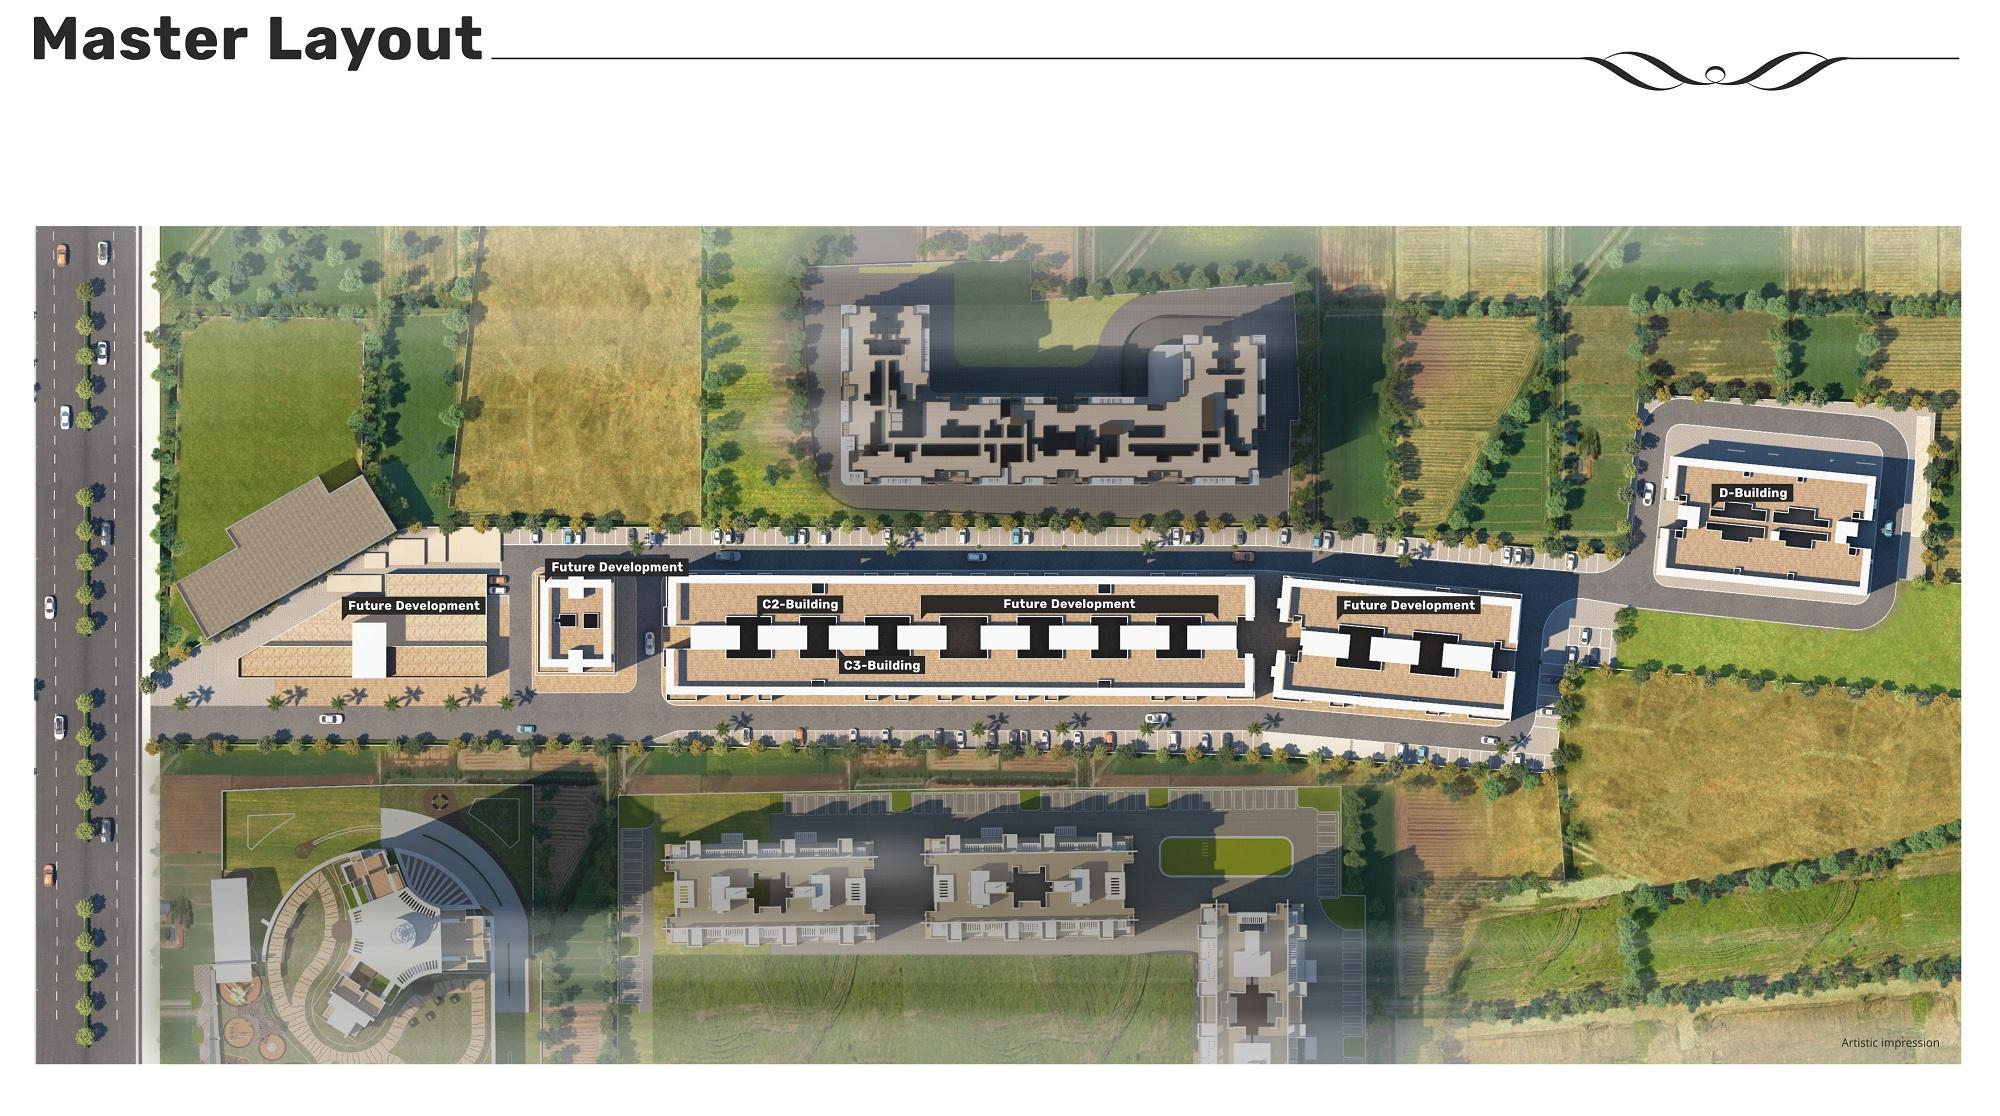 majestique signature towers phase 1 master plan image4